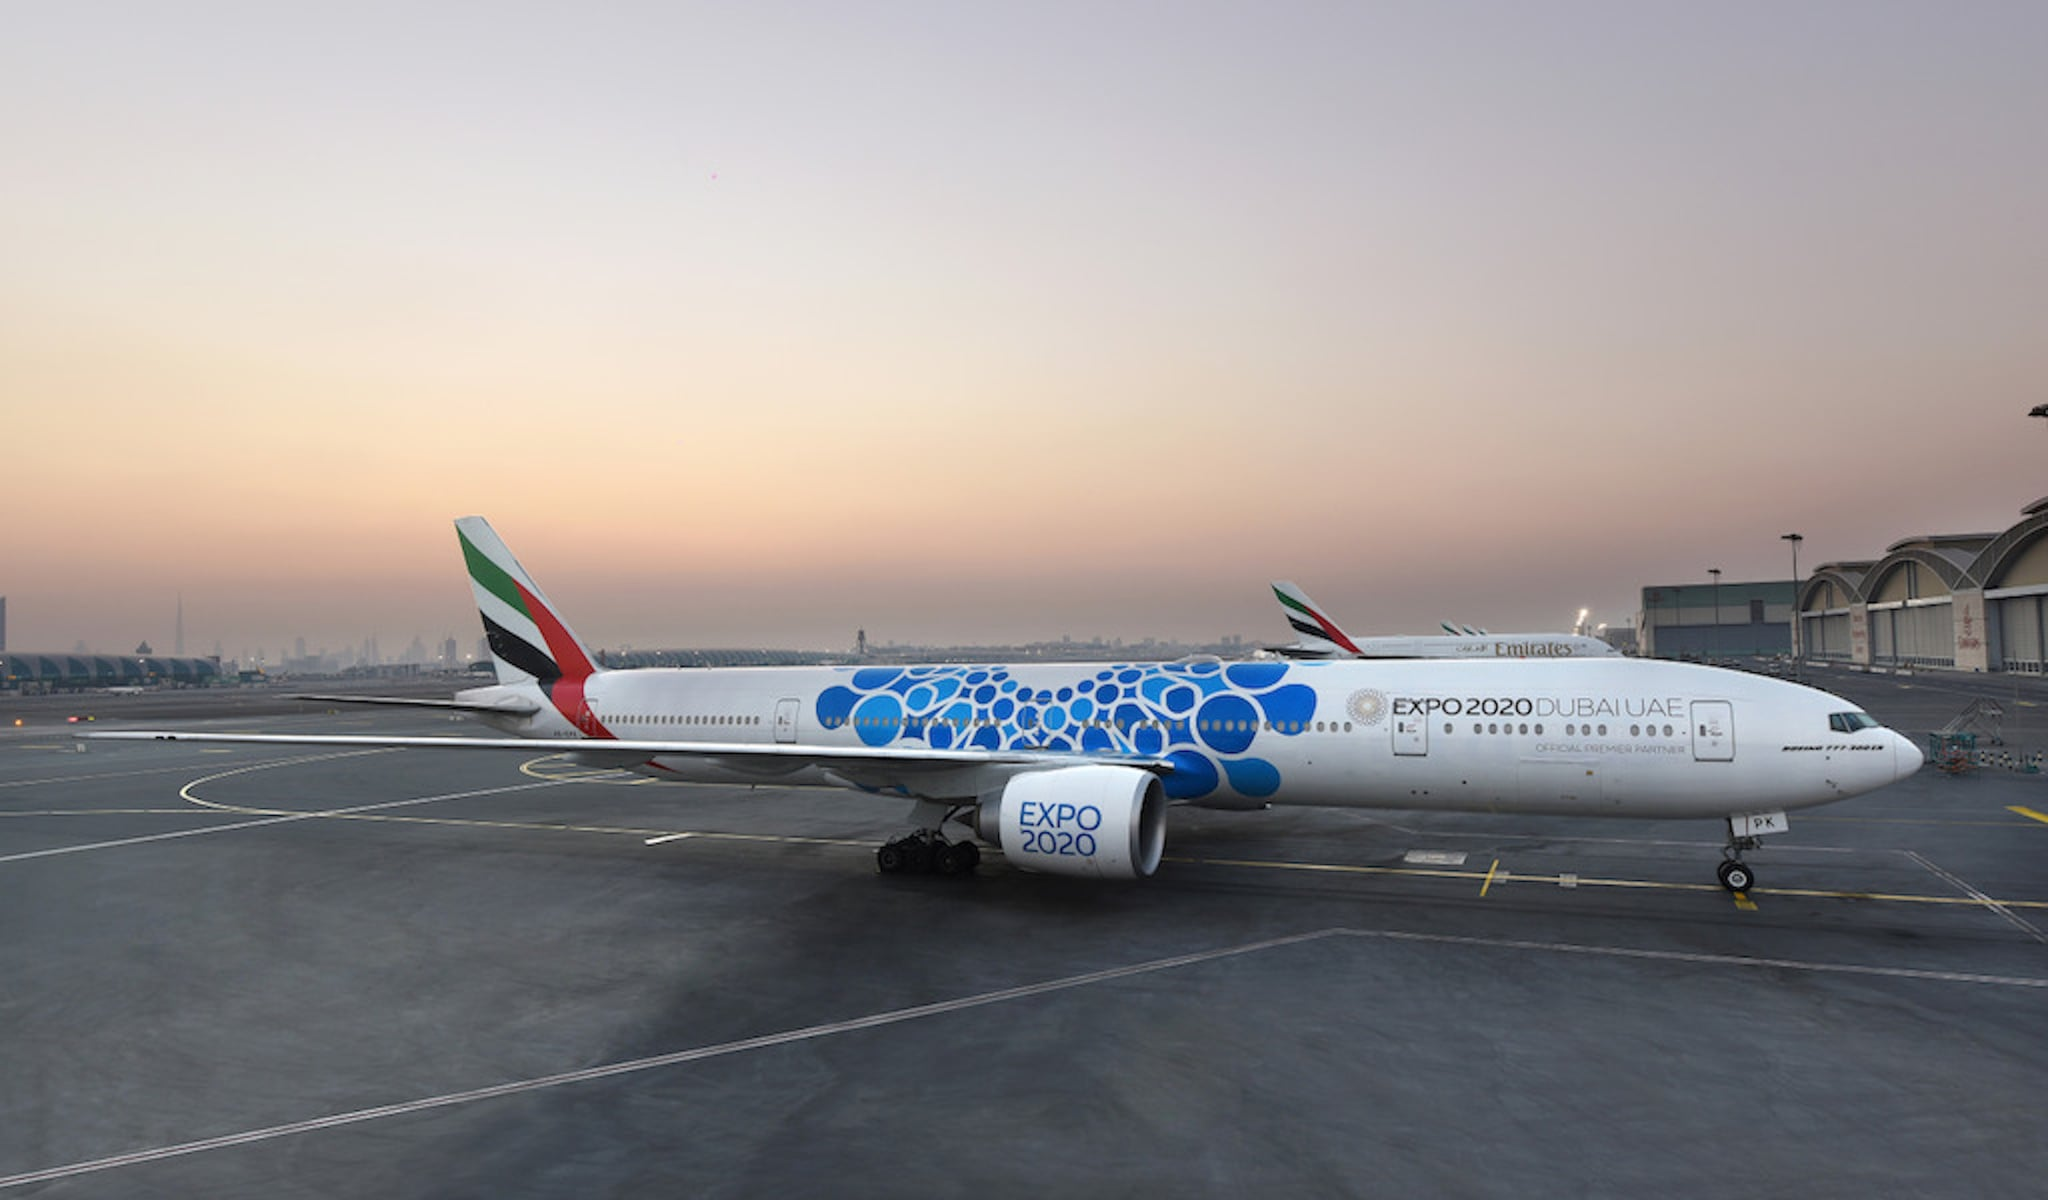 Emirates Paints Planes For Expo 2020 Popsugar Middle